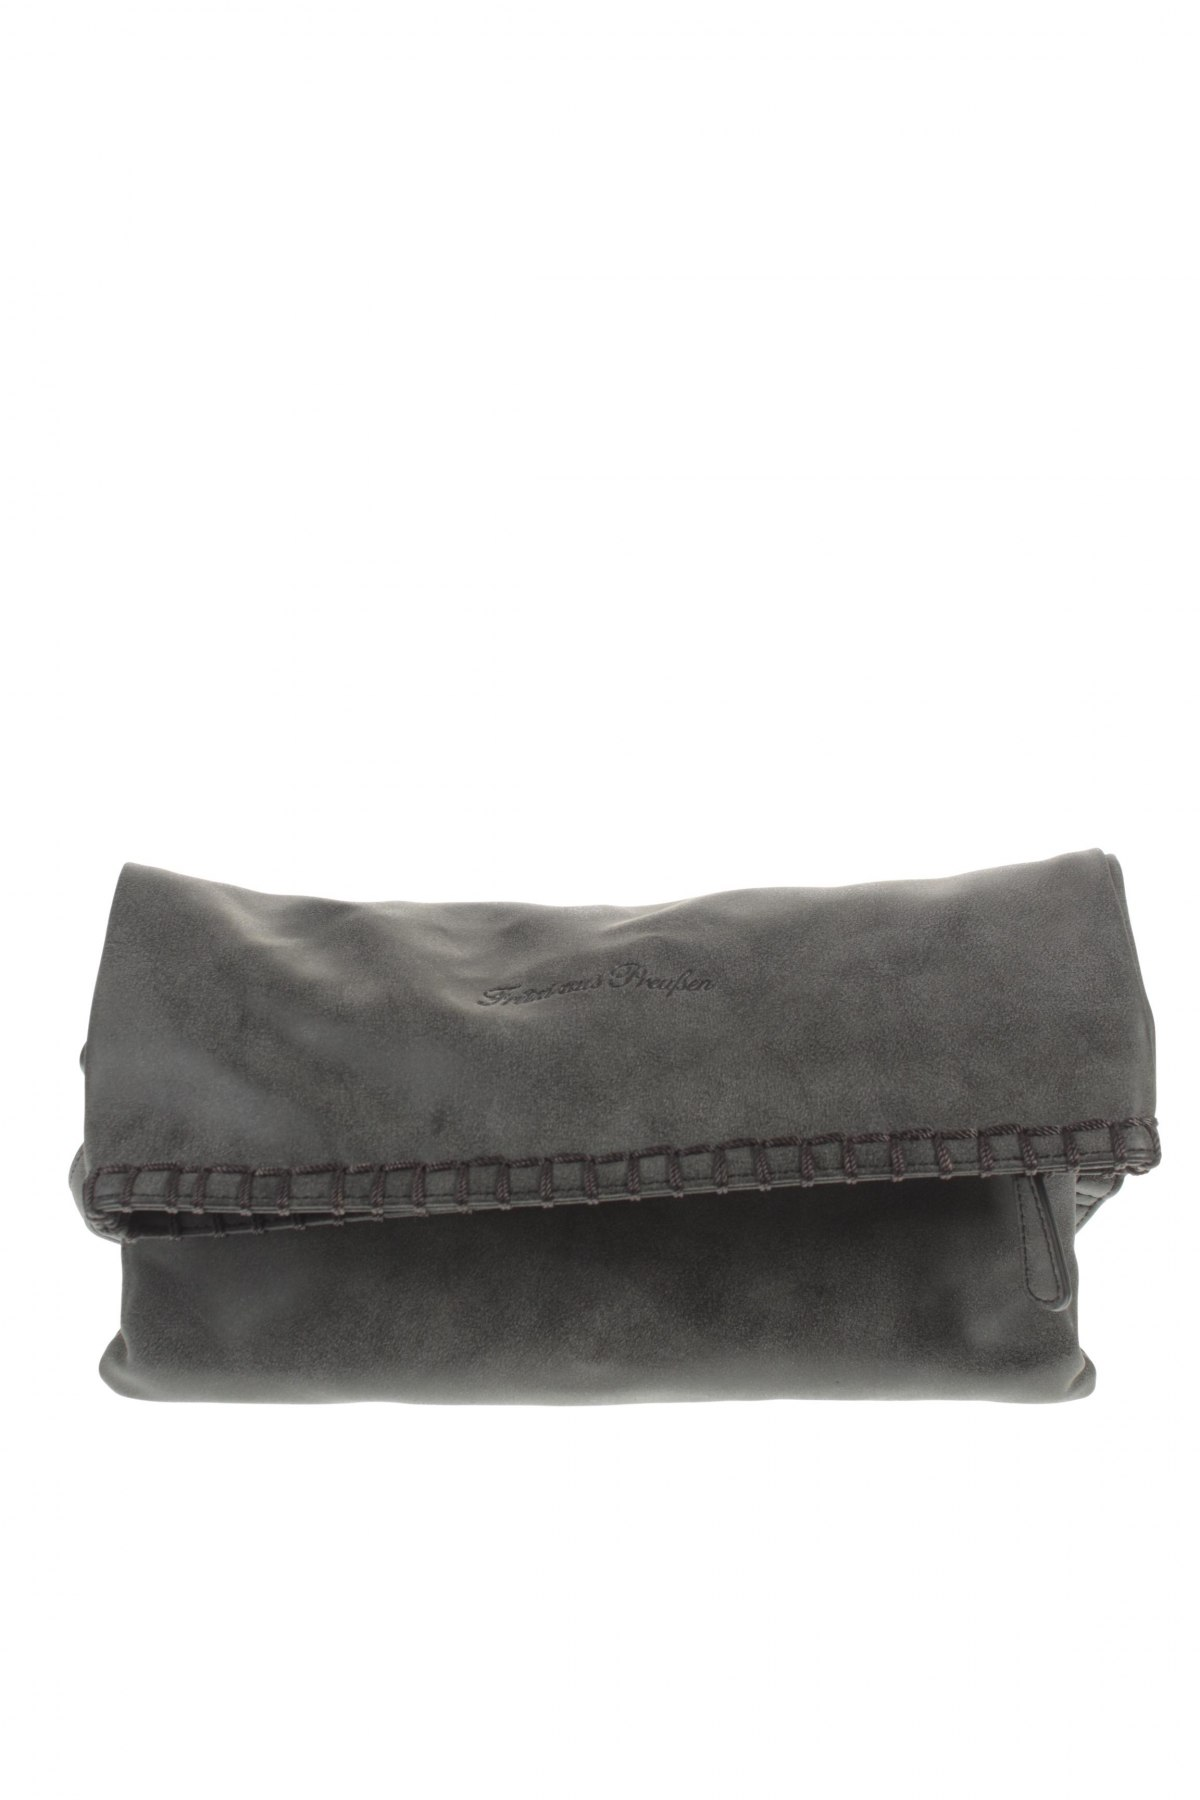 women 39 s bag fritzi aus preussen 8368592 remix. Black Bedroom Furniture Sets. Home Design Ideas